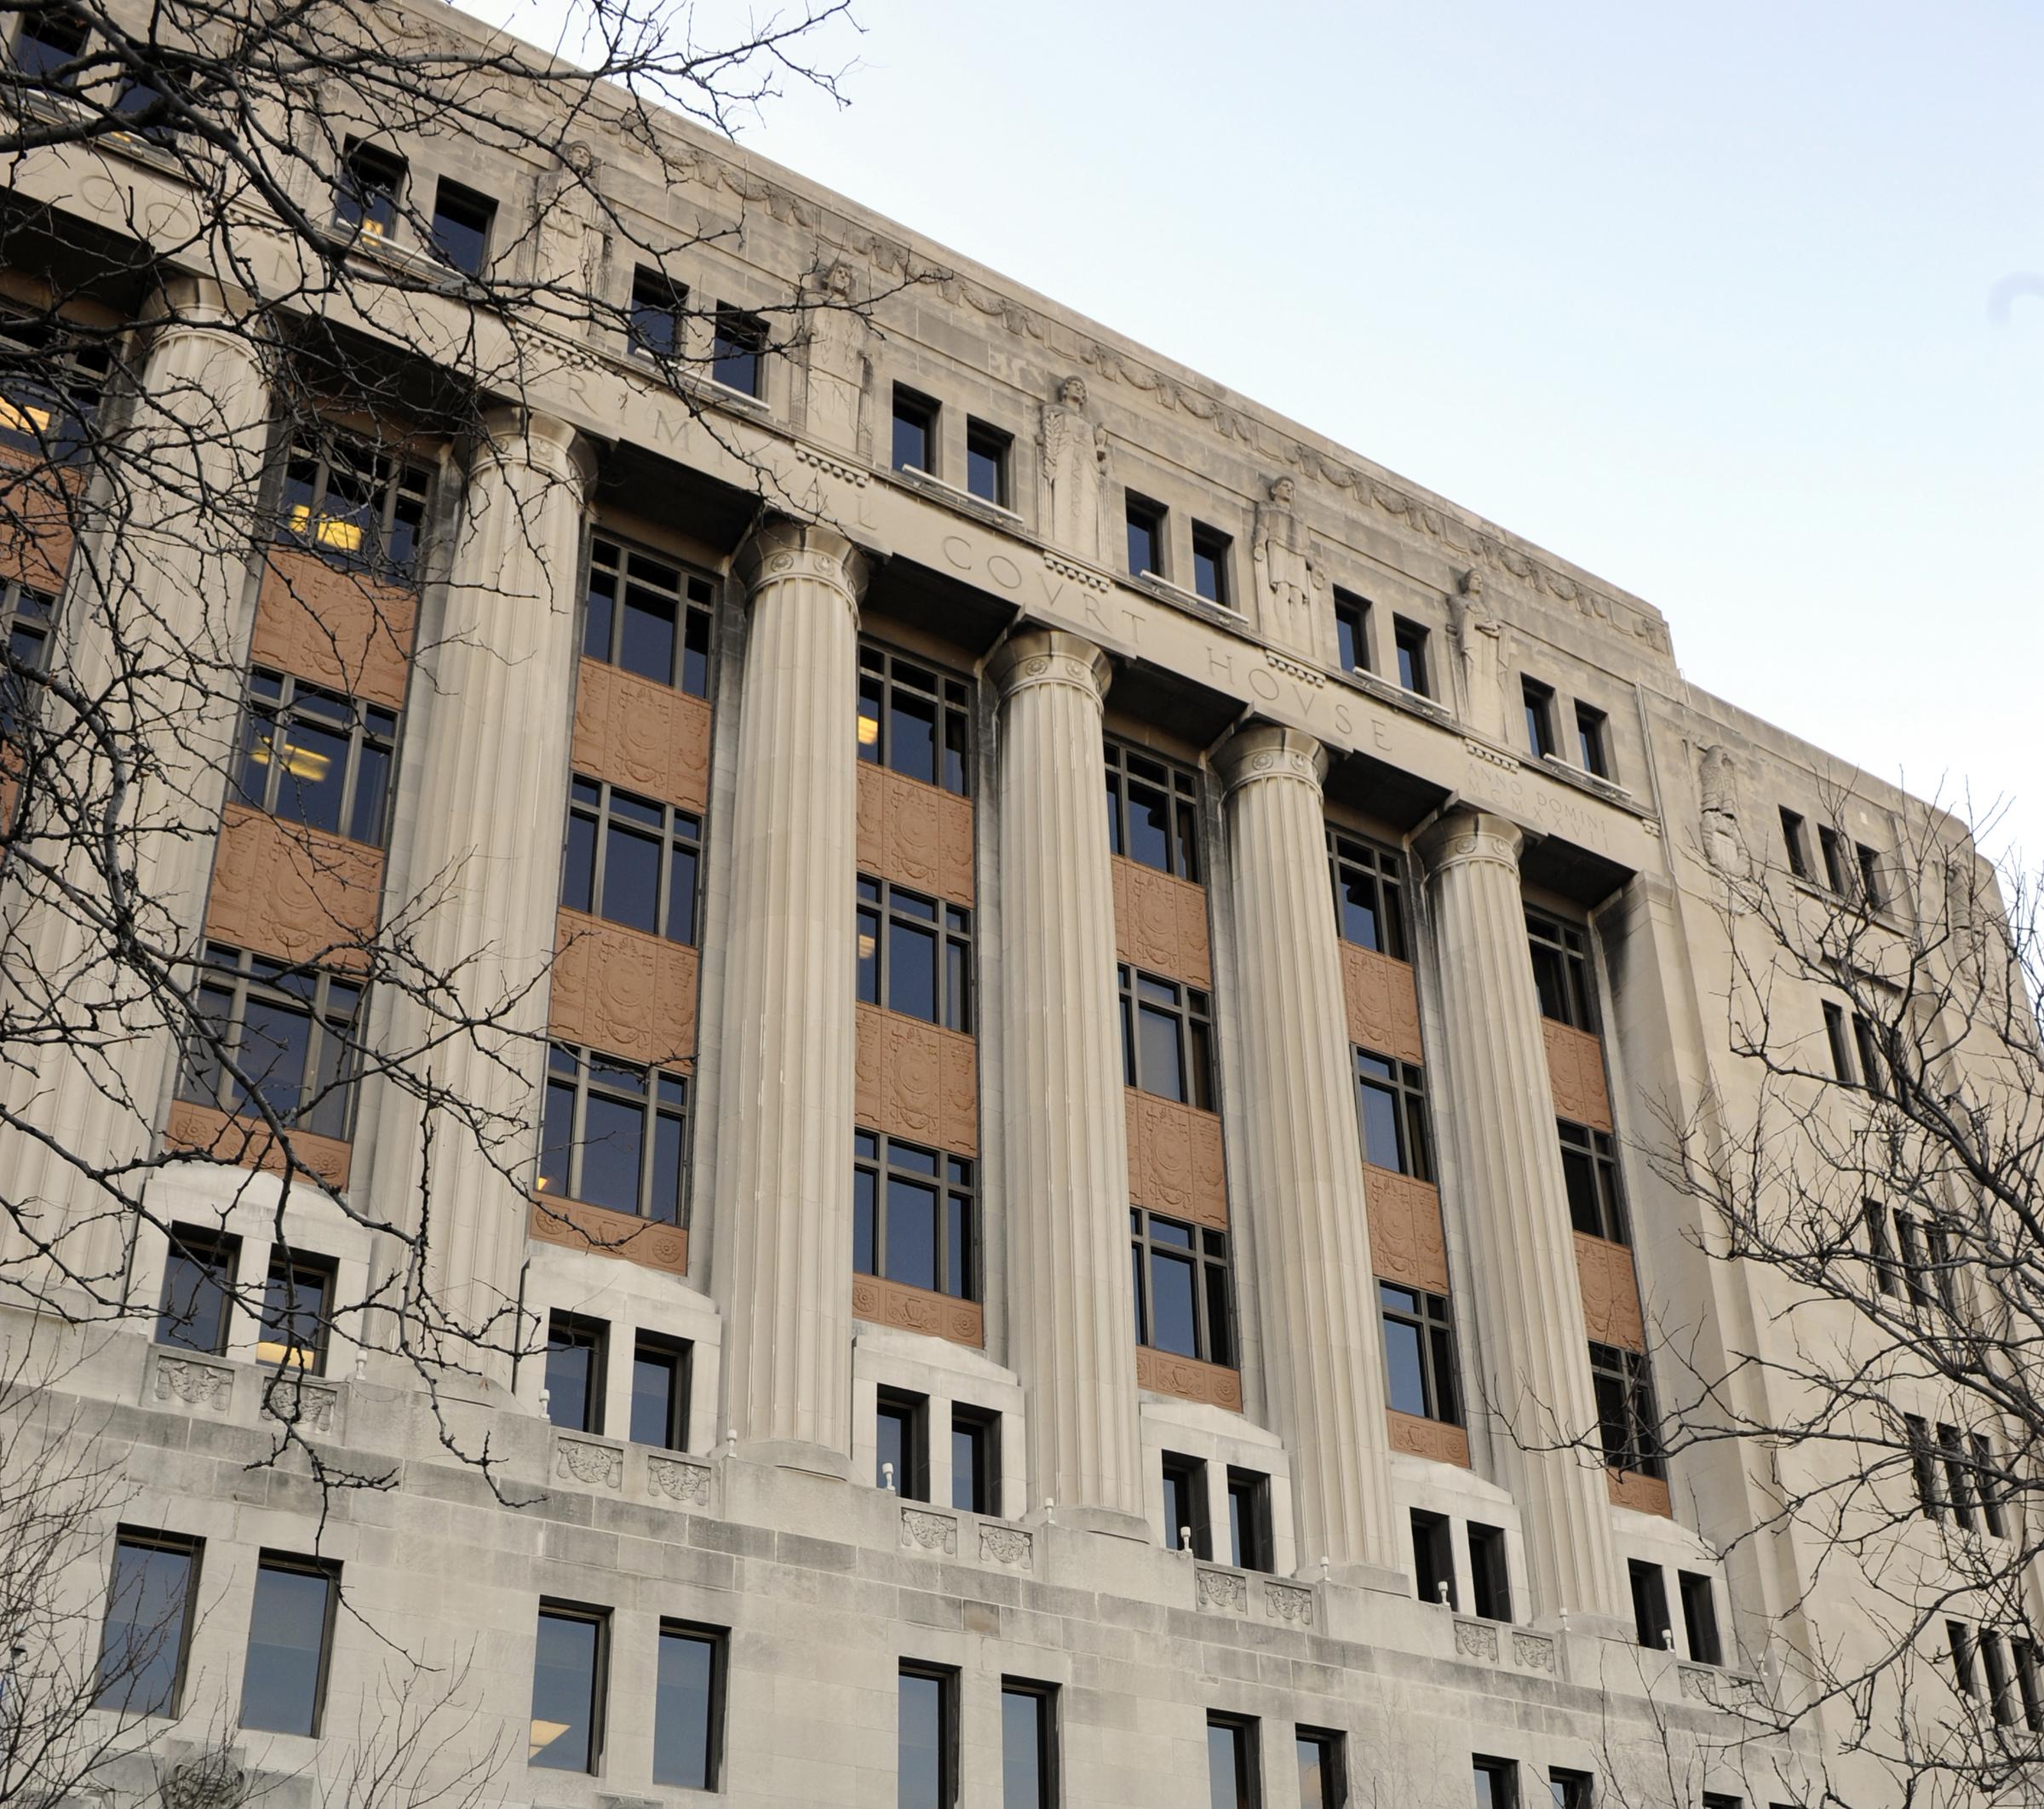 Cook County Criminal Courts, 2601 S. California Blvd.